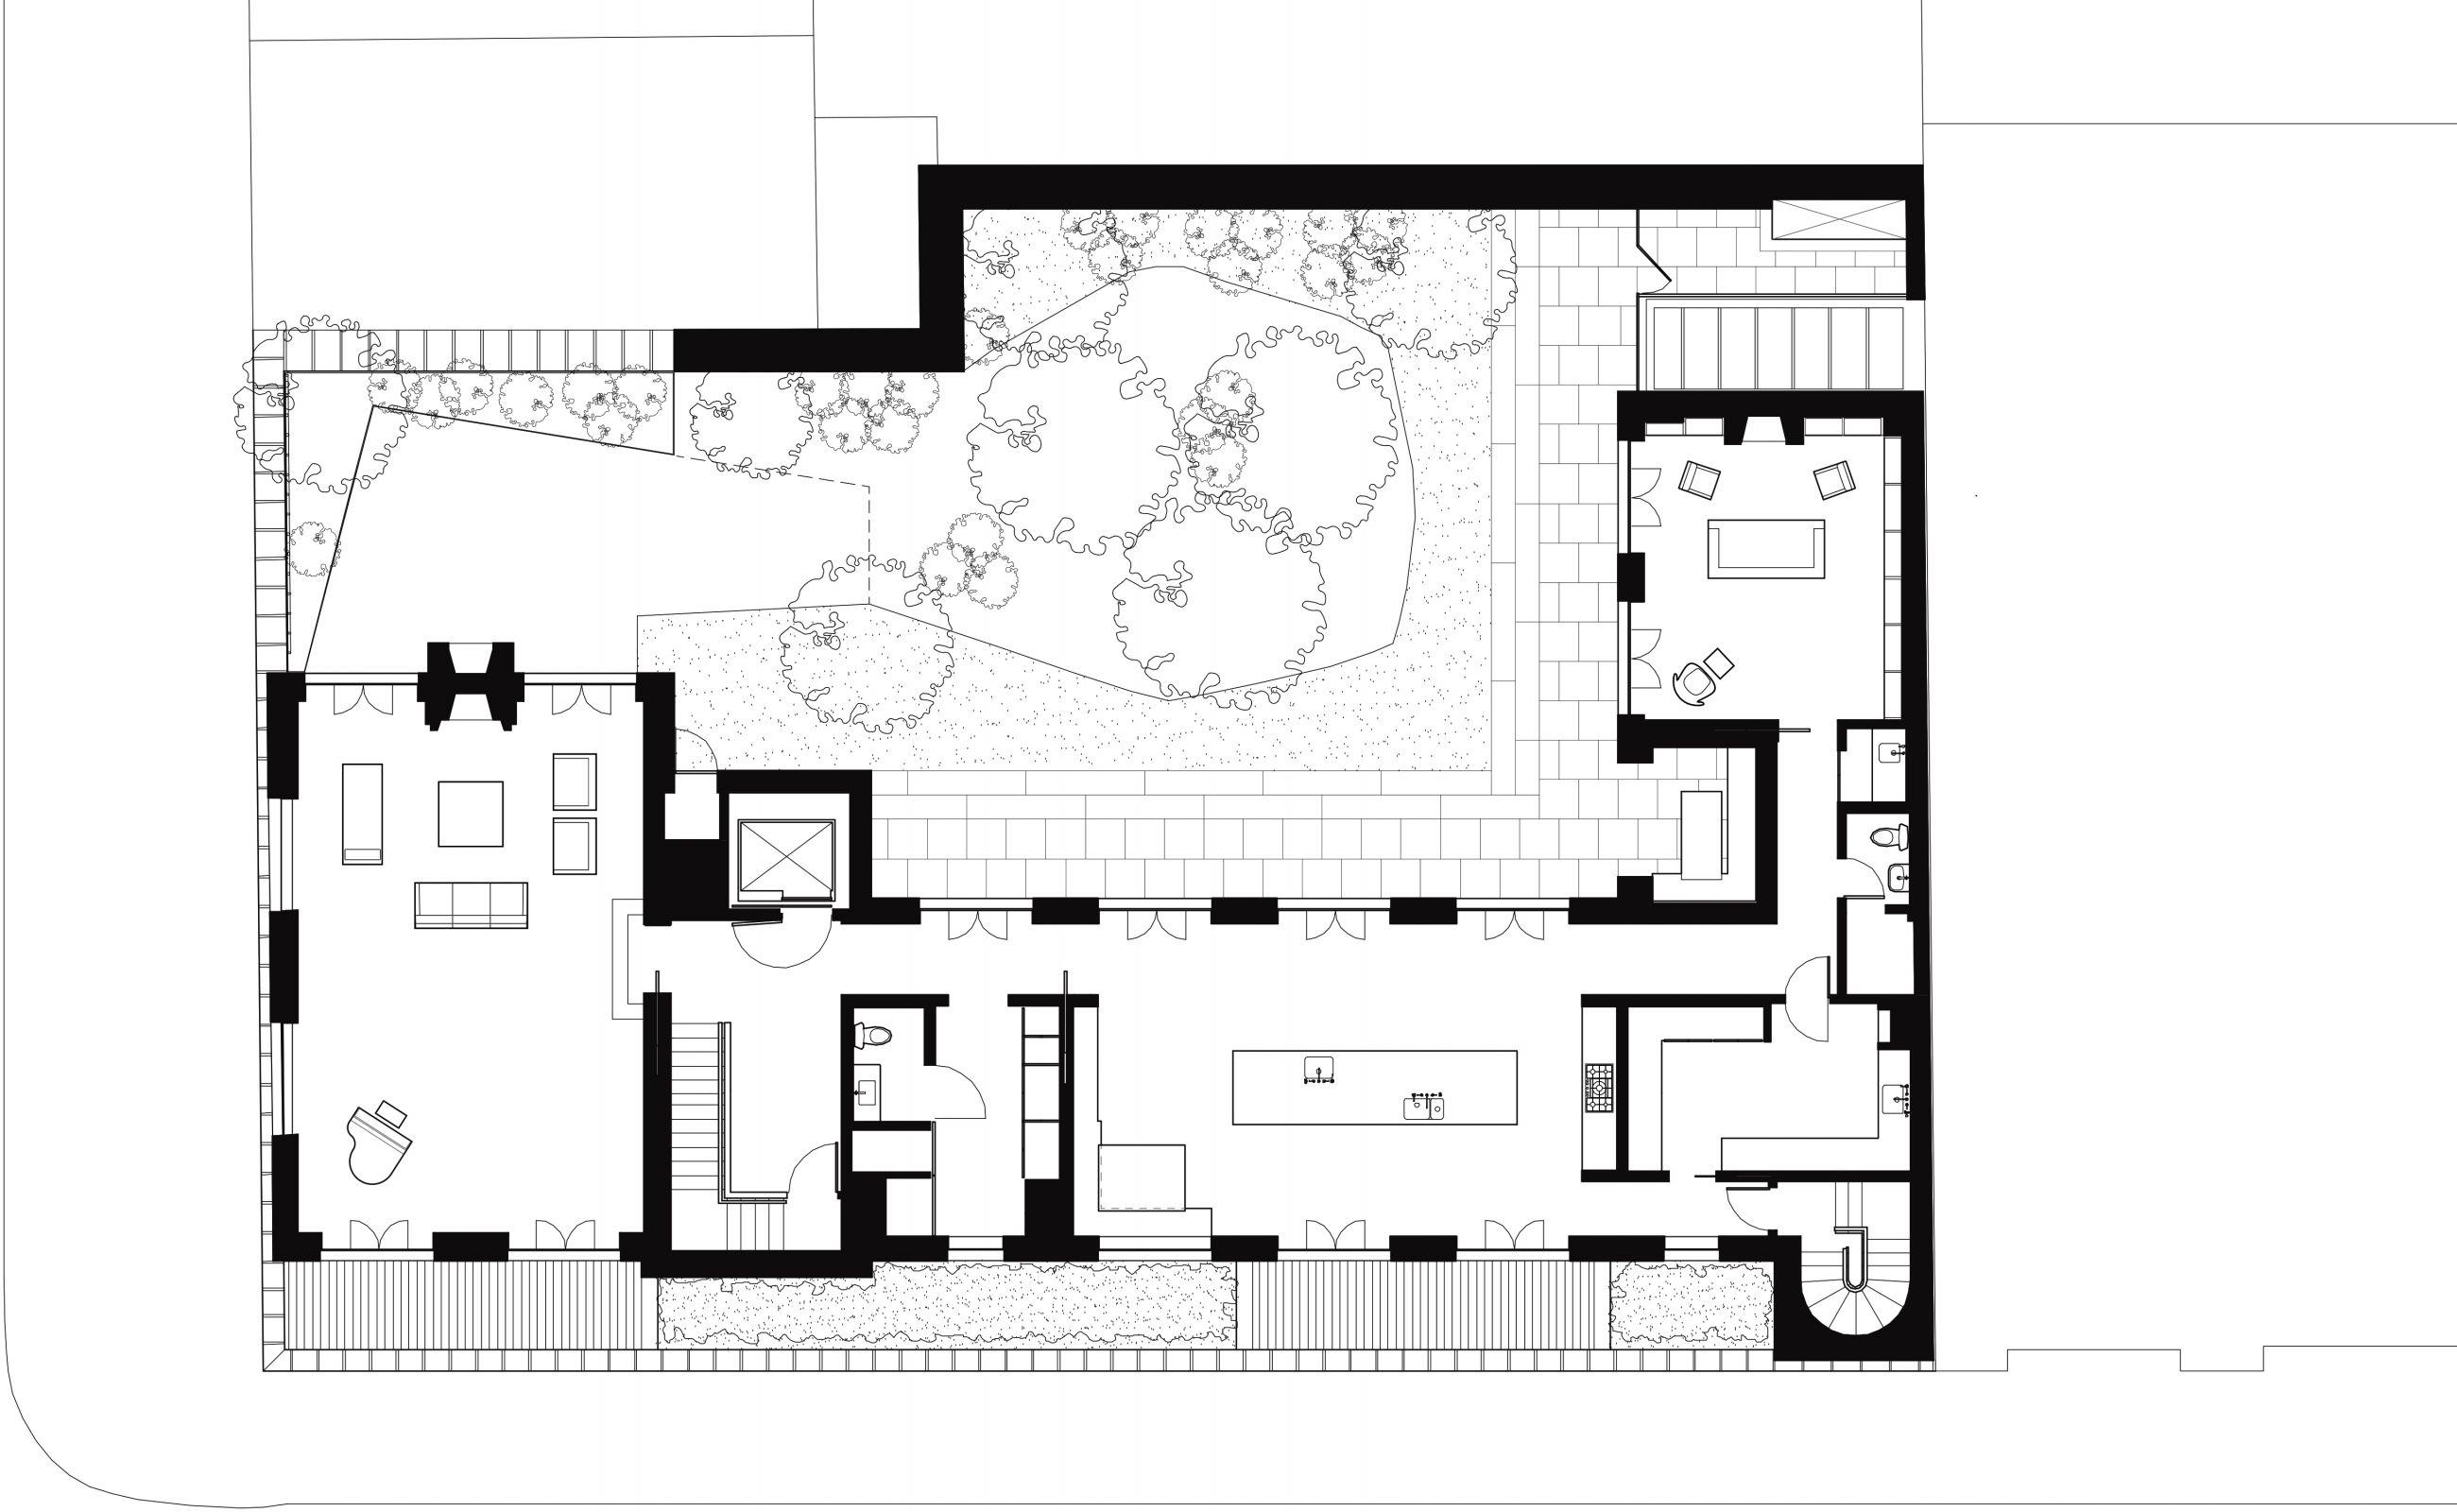 West Village Residence 2nd Floor Plan